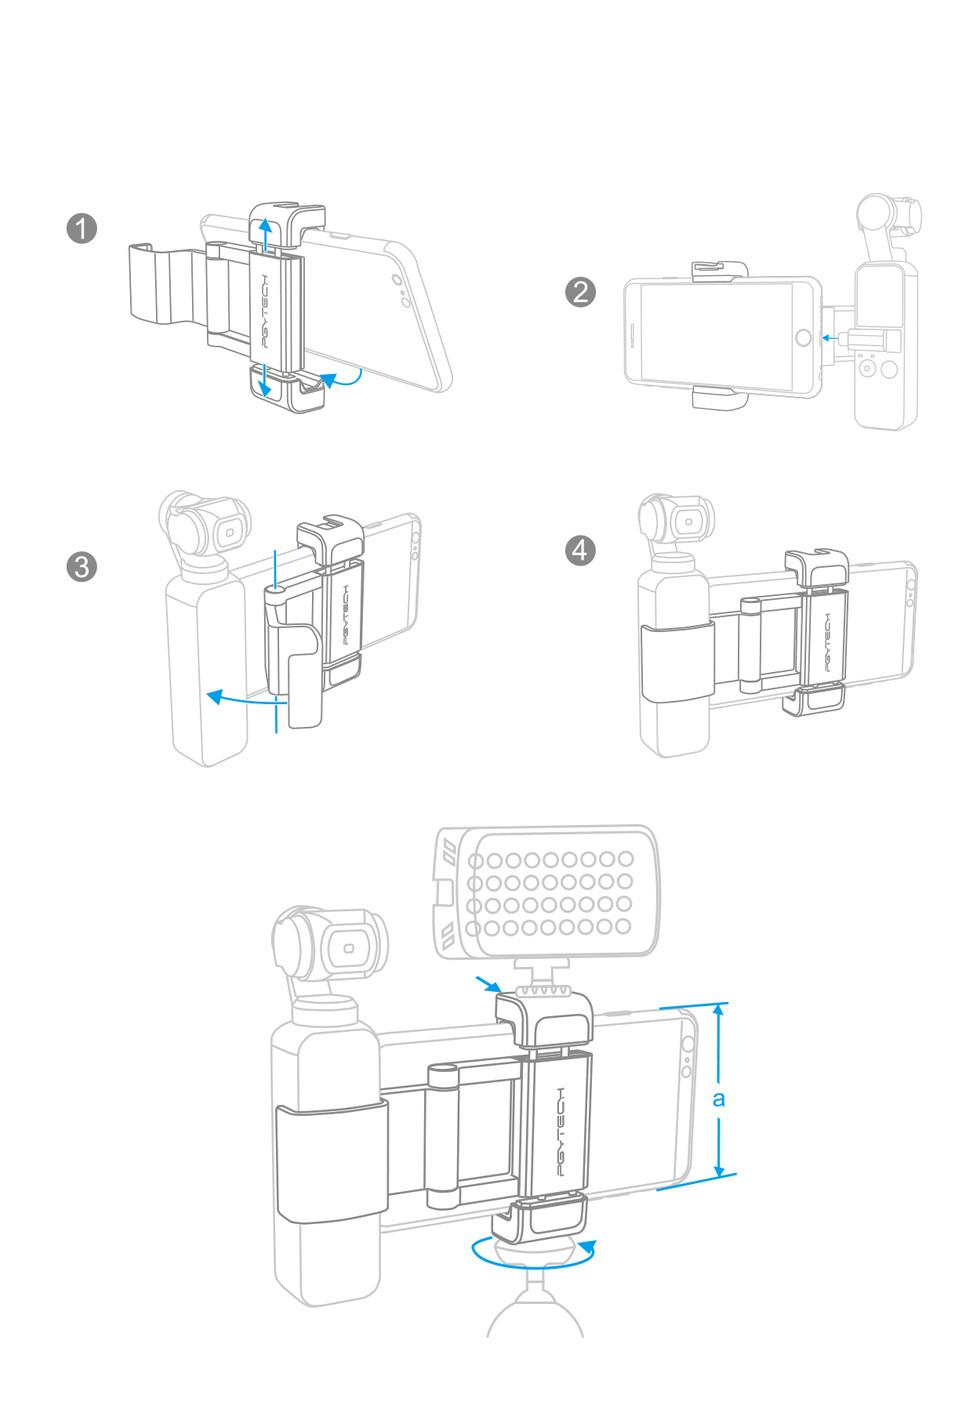 18C手机固定支架Plus-详情页-英文版_13.jpg